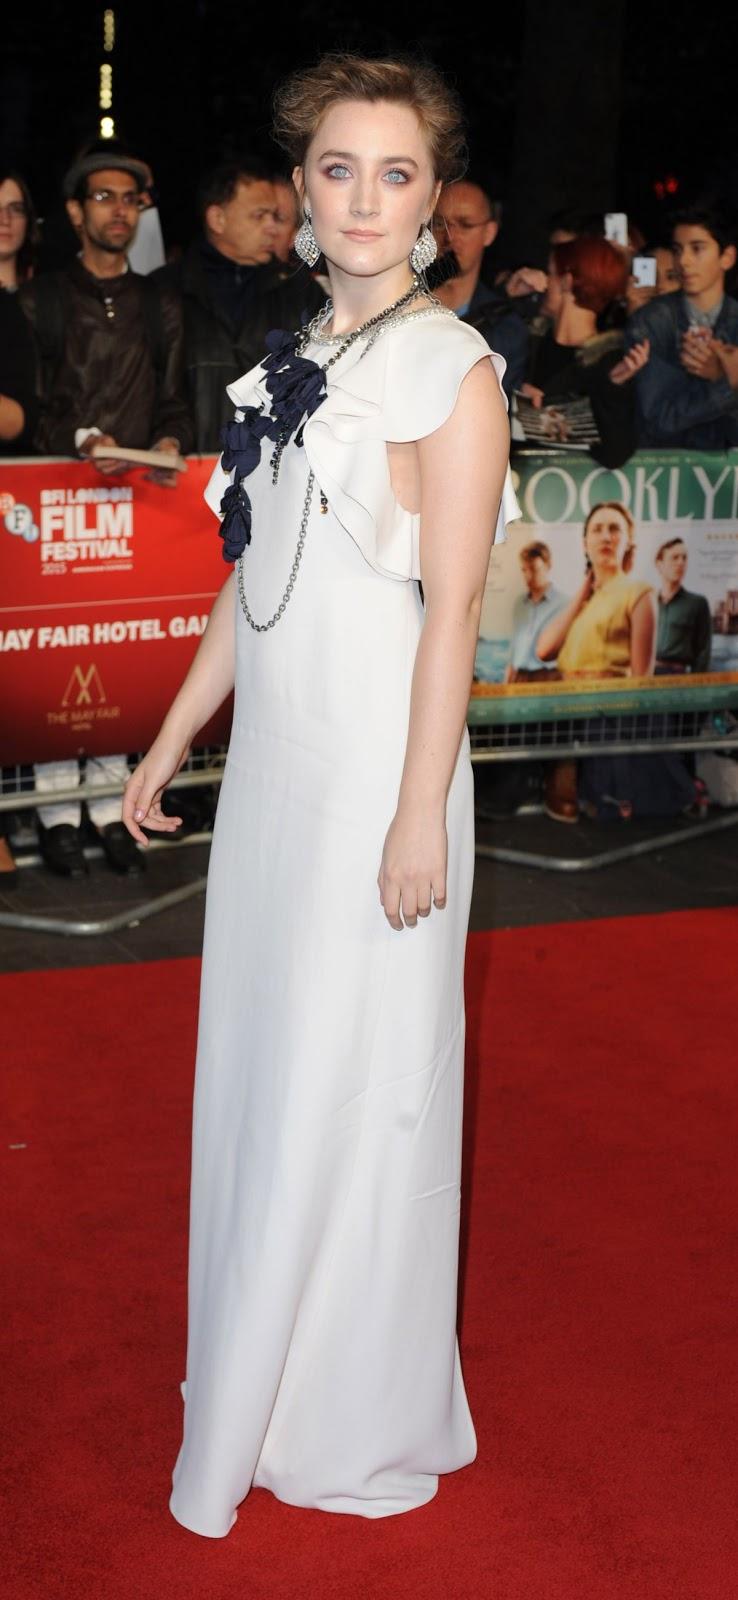 Saoirse Ronan at Brooklyn Premiere at BFI London Film Festival